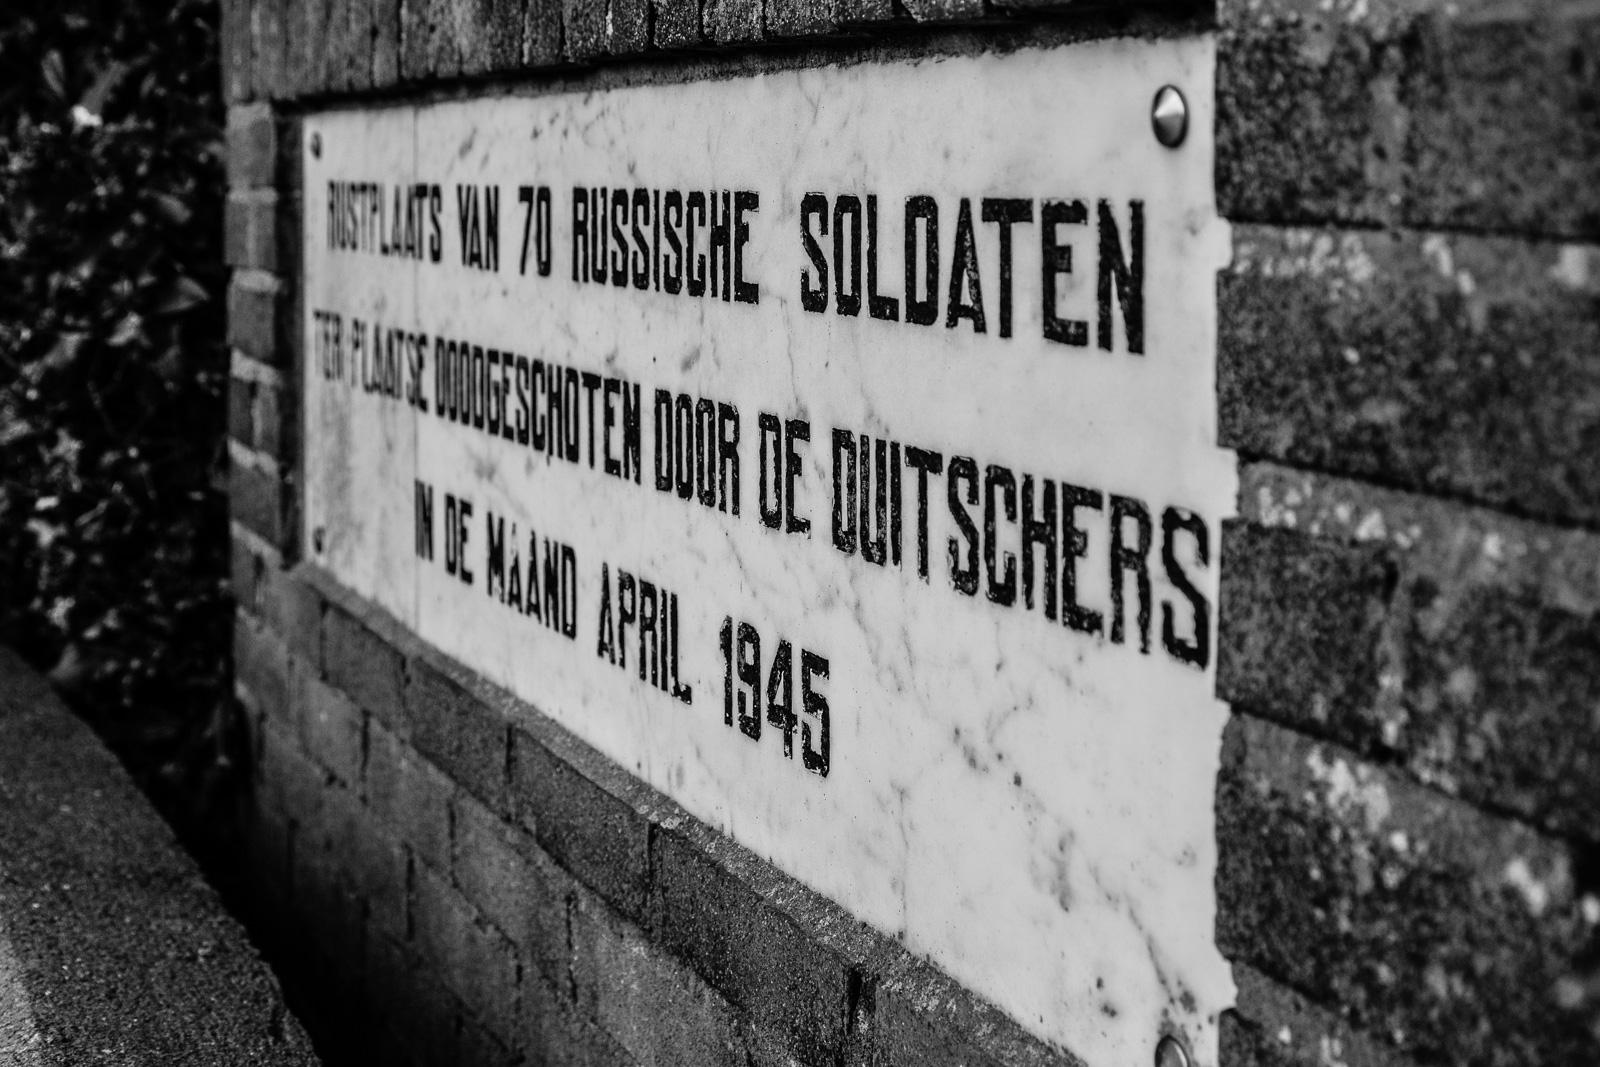 03111906 - April 1945